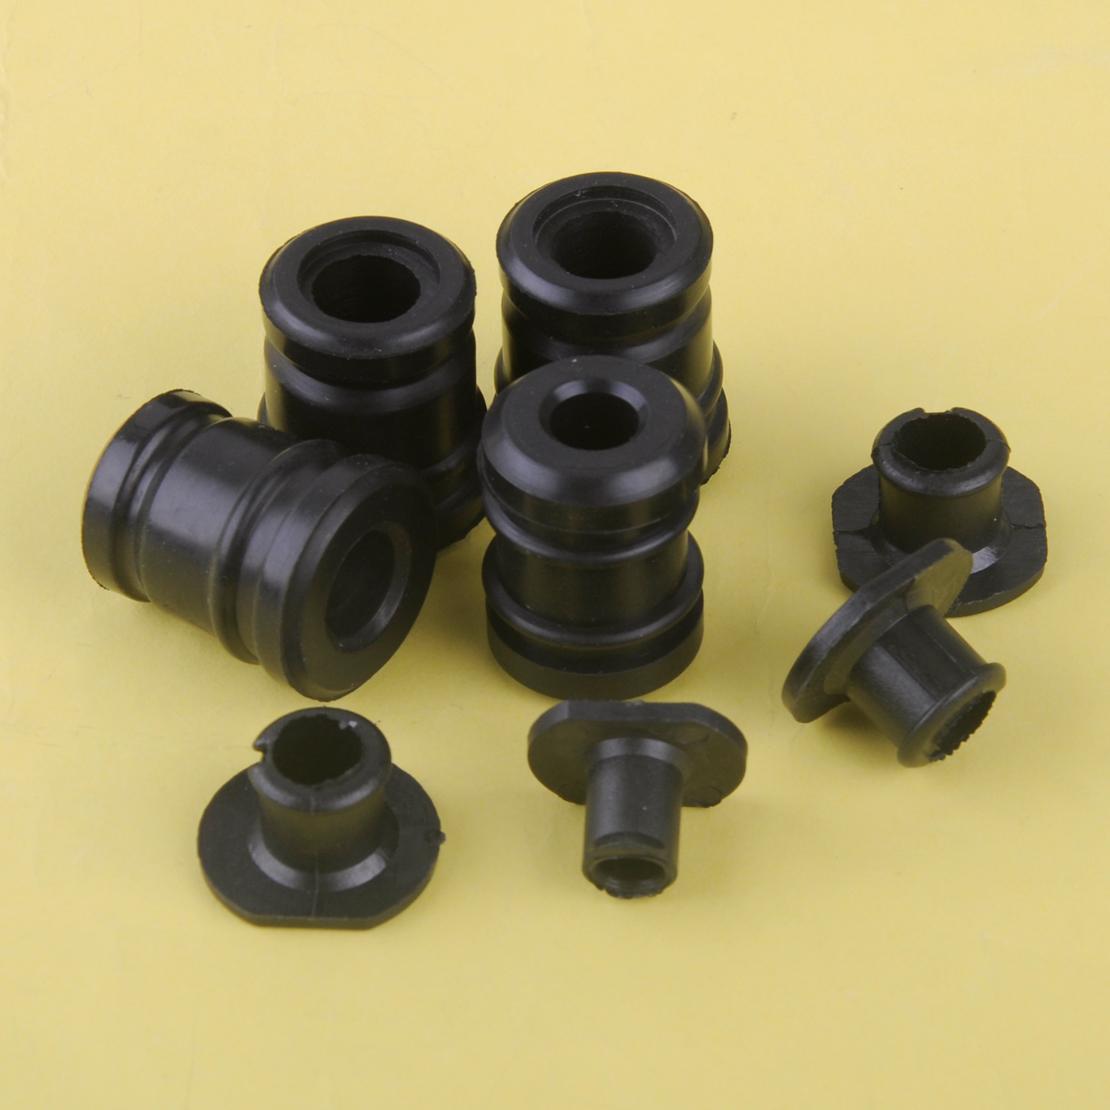 4x Vibrationsdaempfer Ringpuffer für Stihl 029 039 MS210 MS230 MS250 MS290 MS390